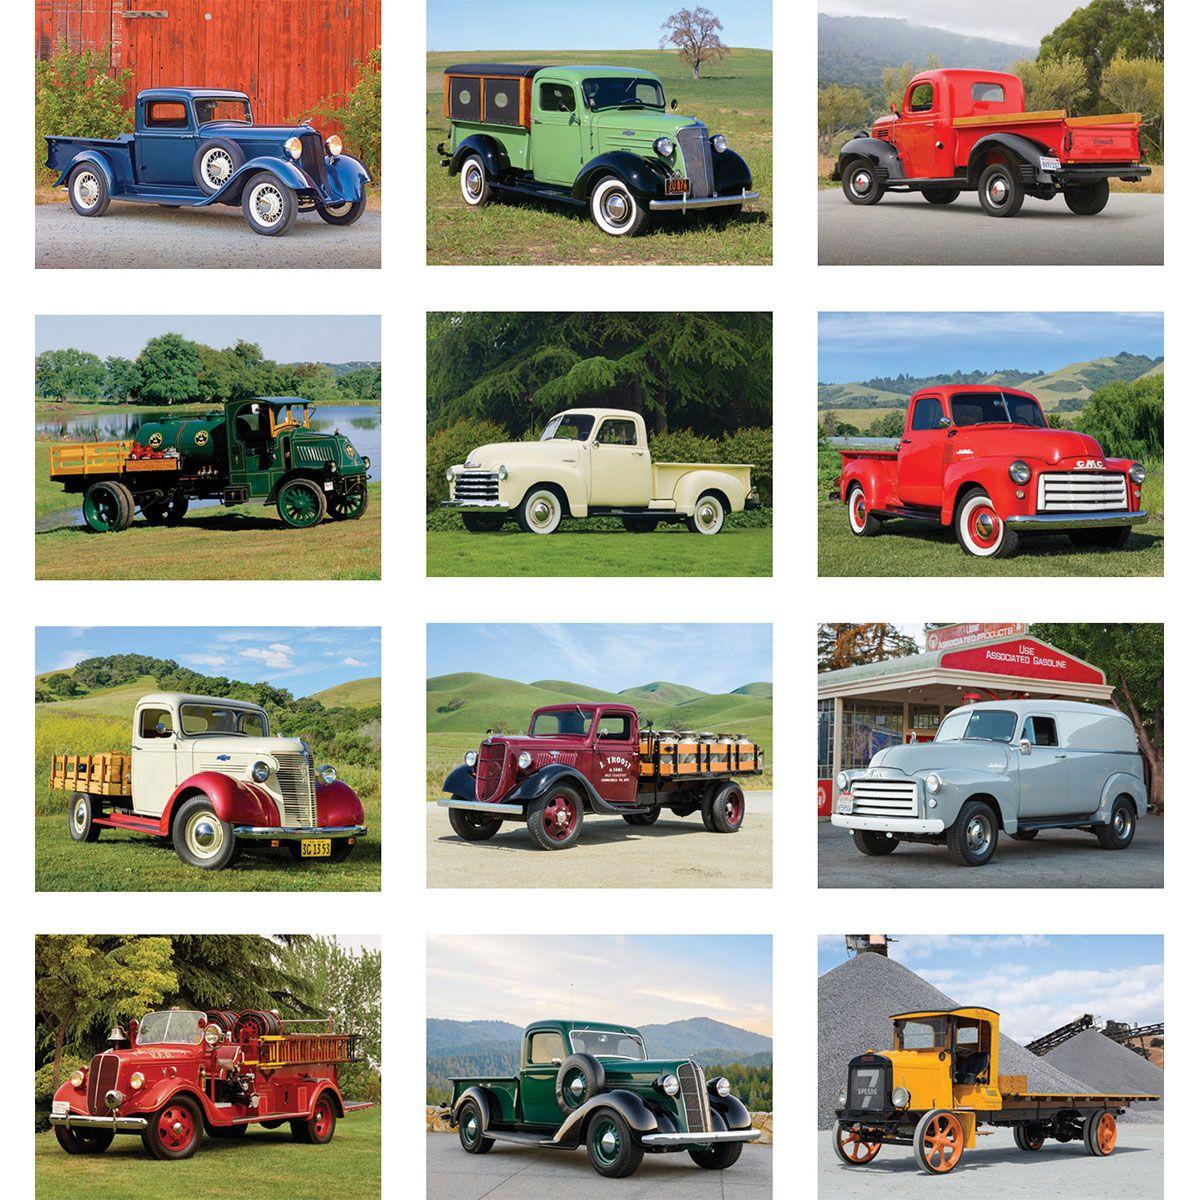 2018 Antique Truck Calendar, 2018 Imprinted Calendars, 2018 calendar ...